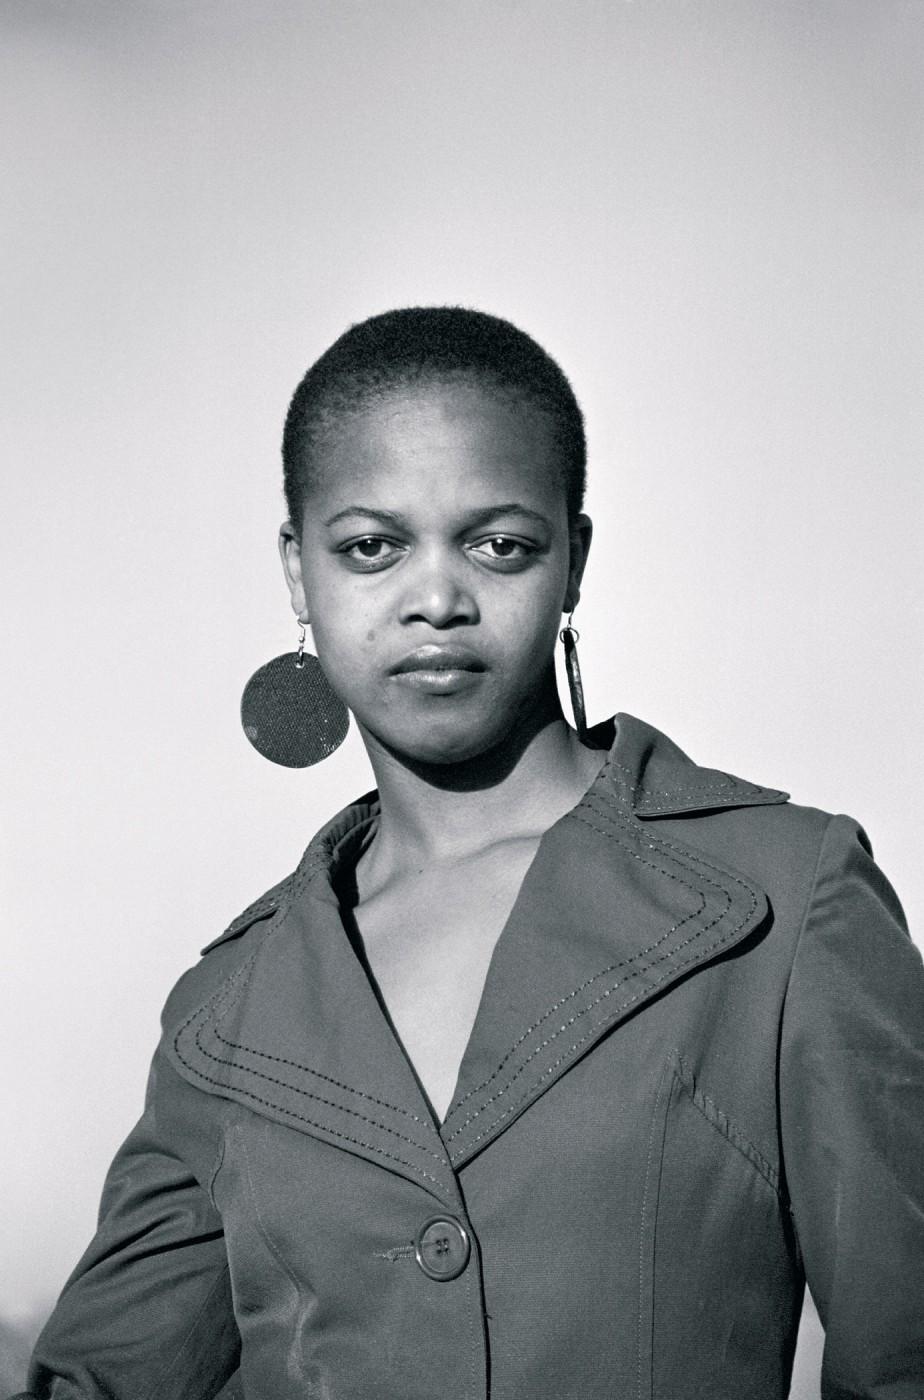 Zanele Muholi, </span><span><em>Nosi 'Ginga' Marumo, Yeoville, Johannesburg</em>, </span><span>2007 © Zanele Muholi and Stevenson Cape Town/Johannesburg